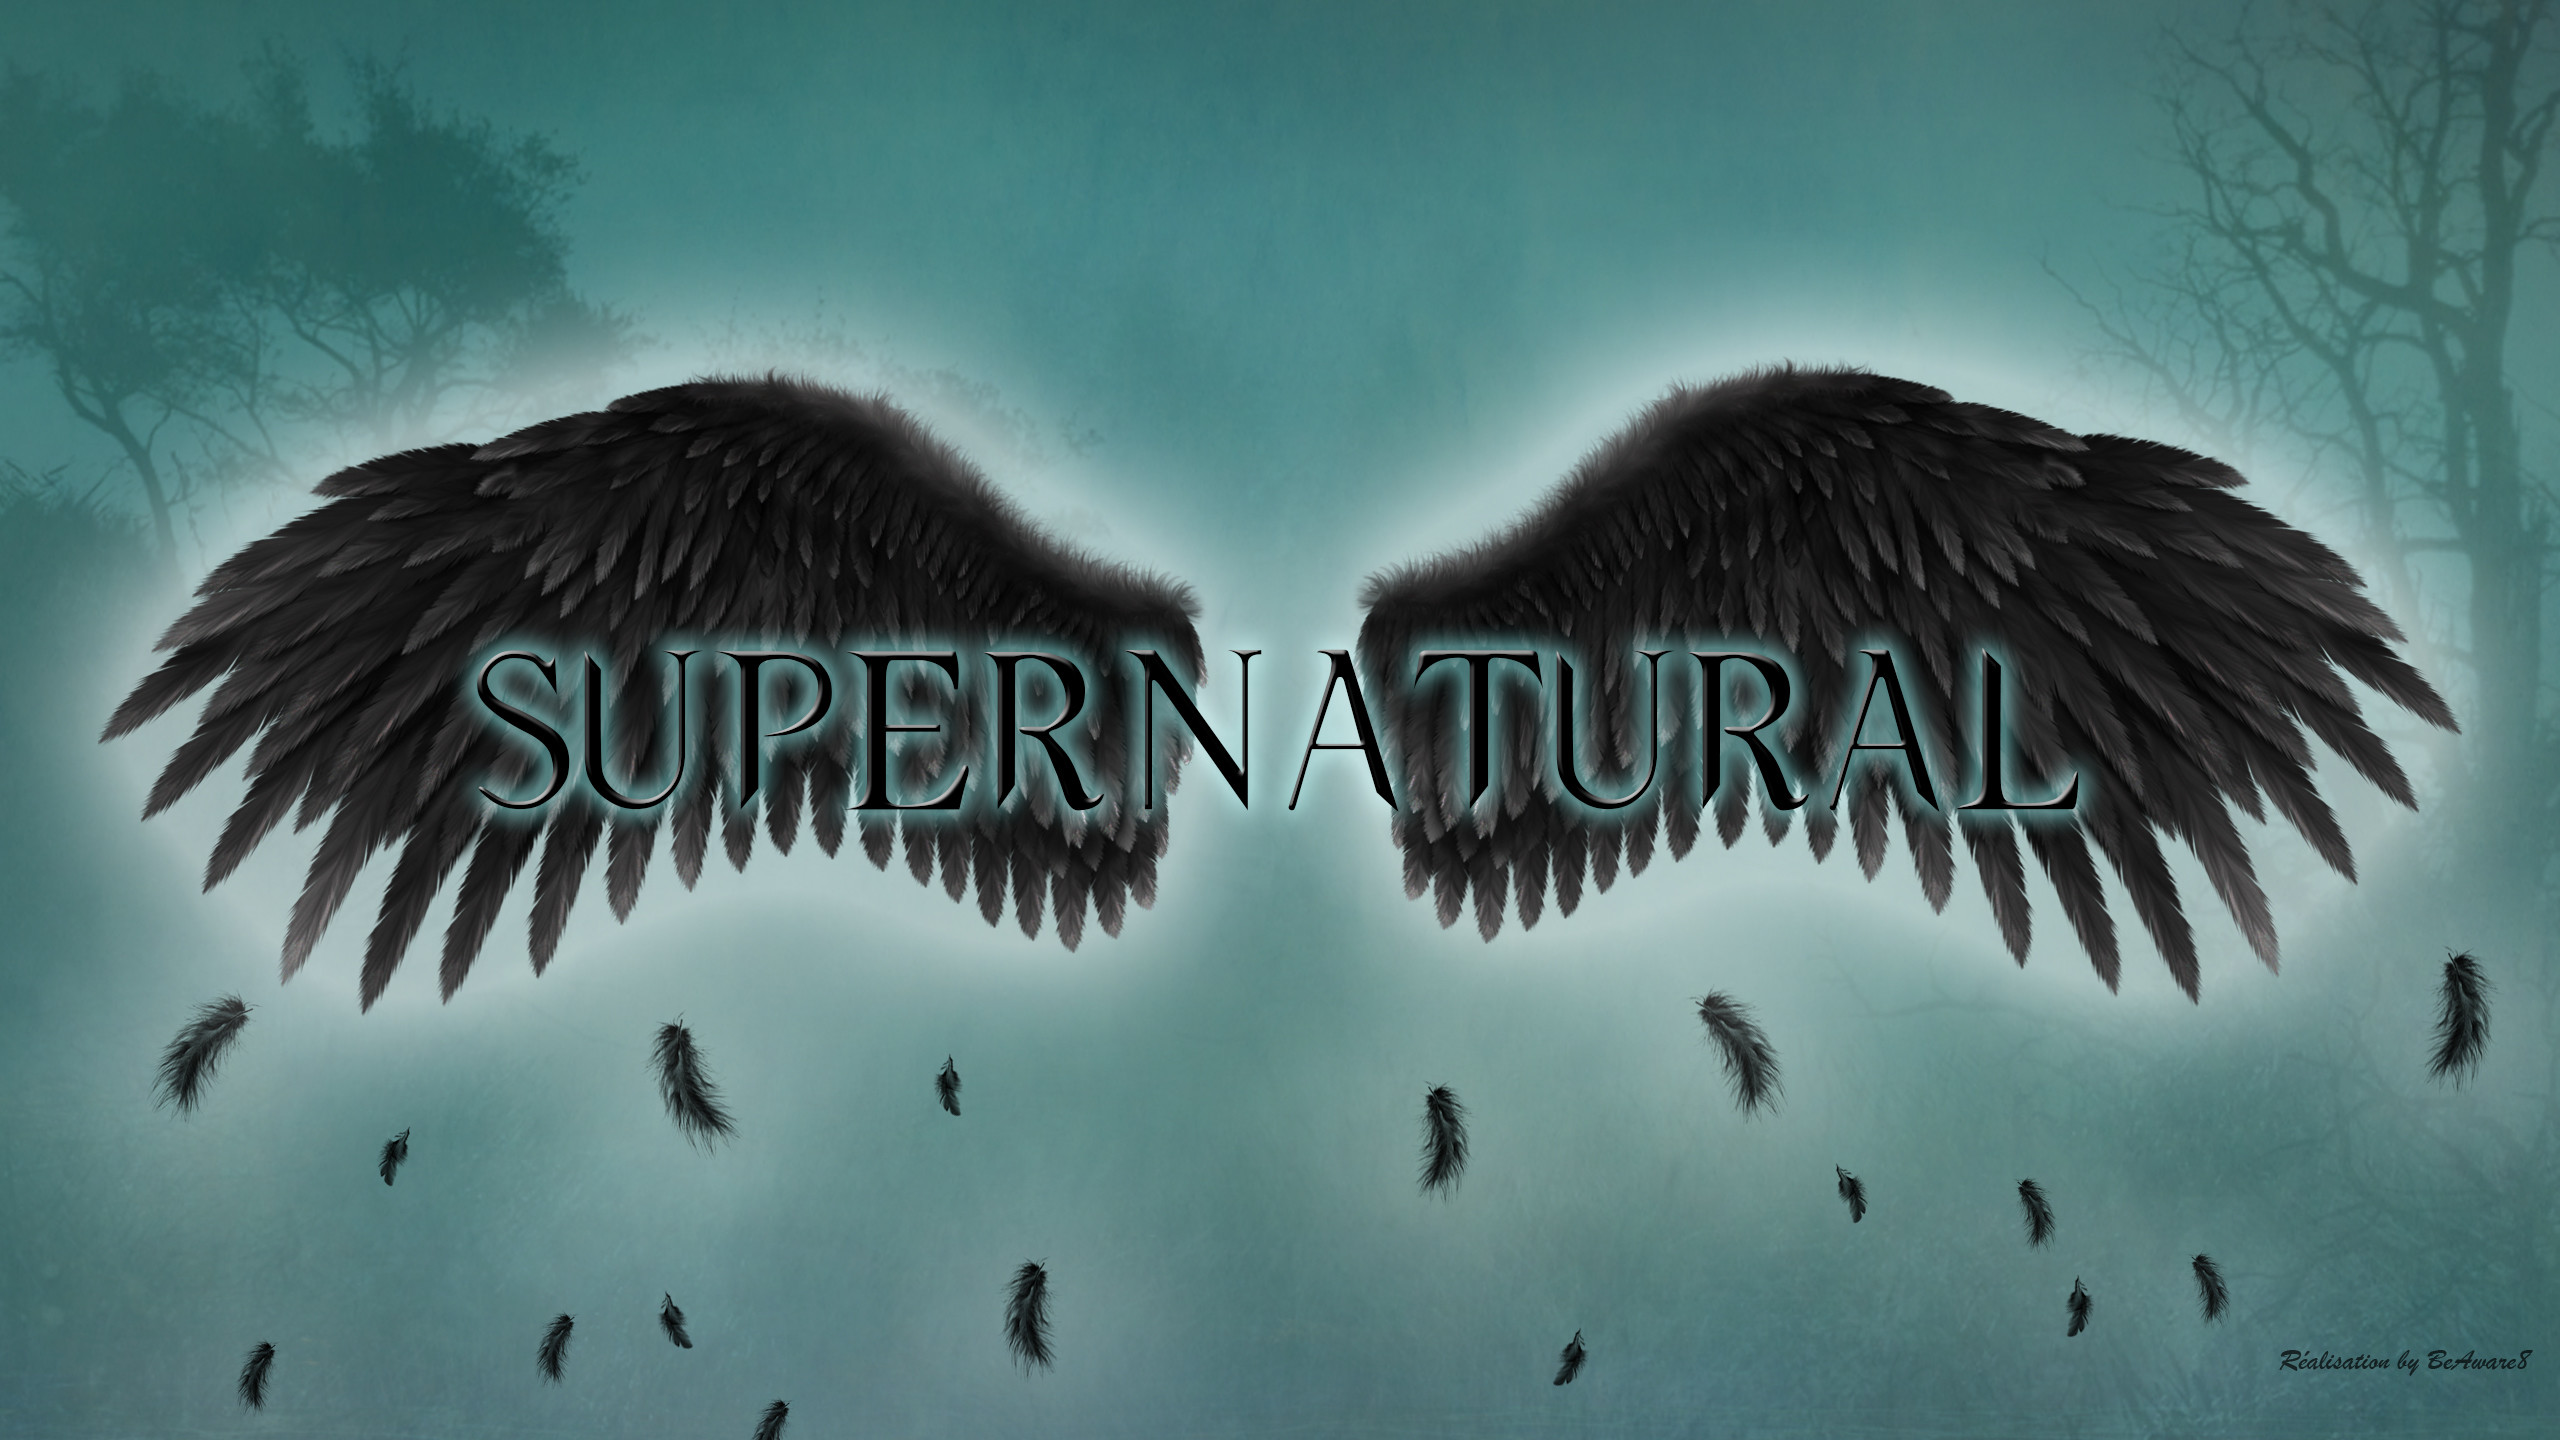 … Supernatural – the fallen angel wings by BeAware8